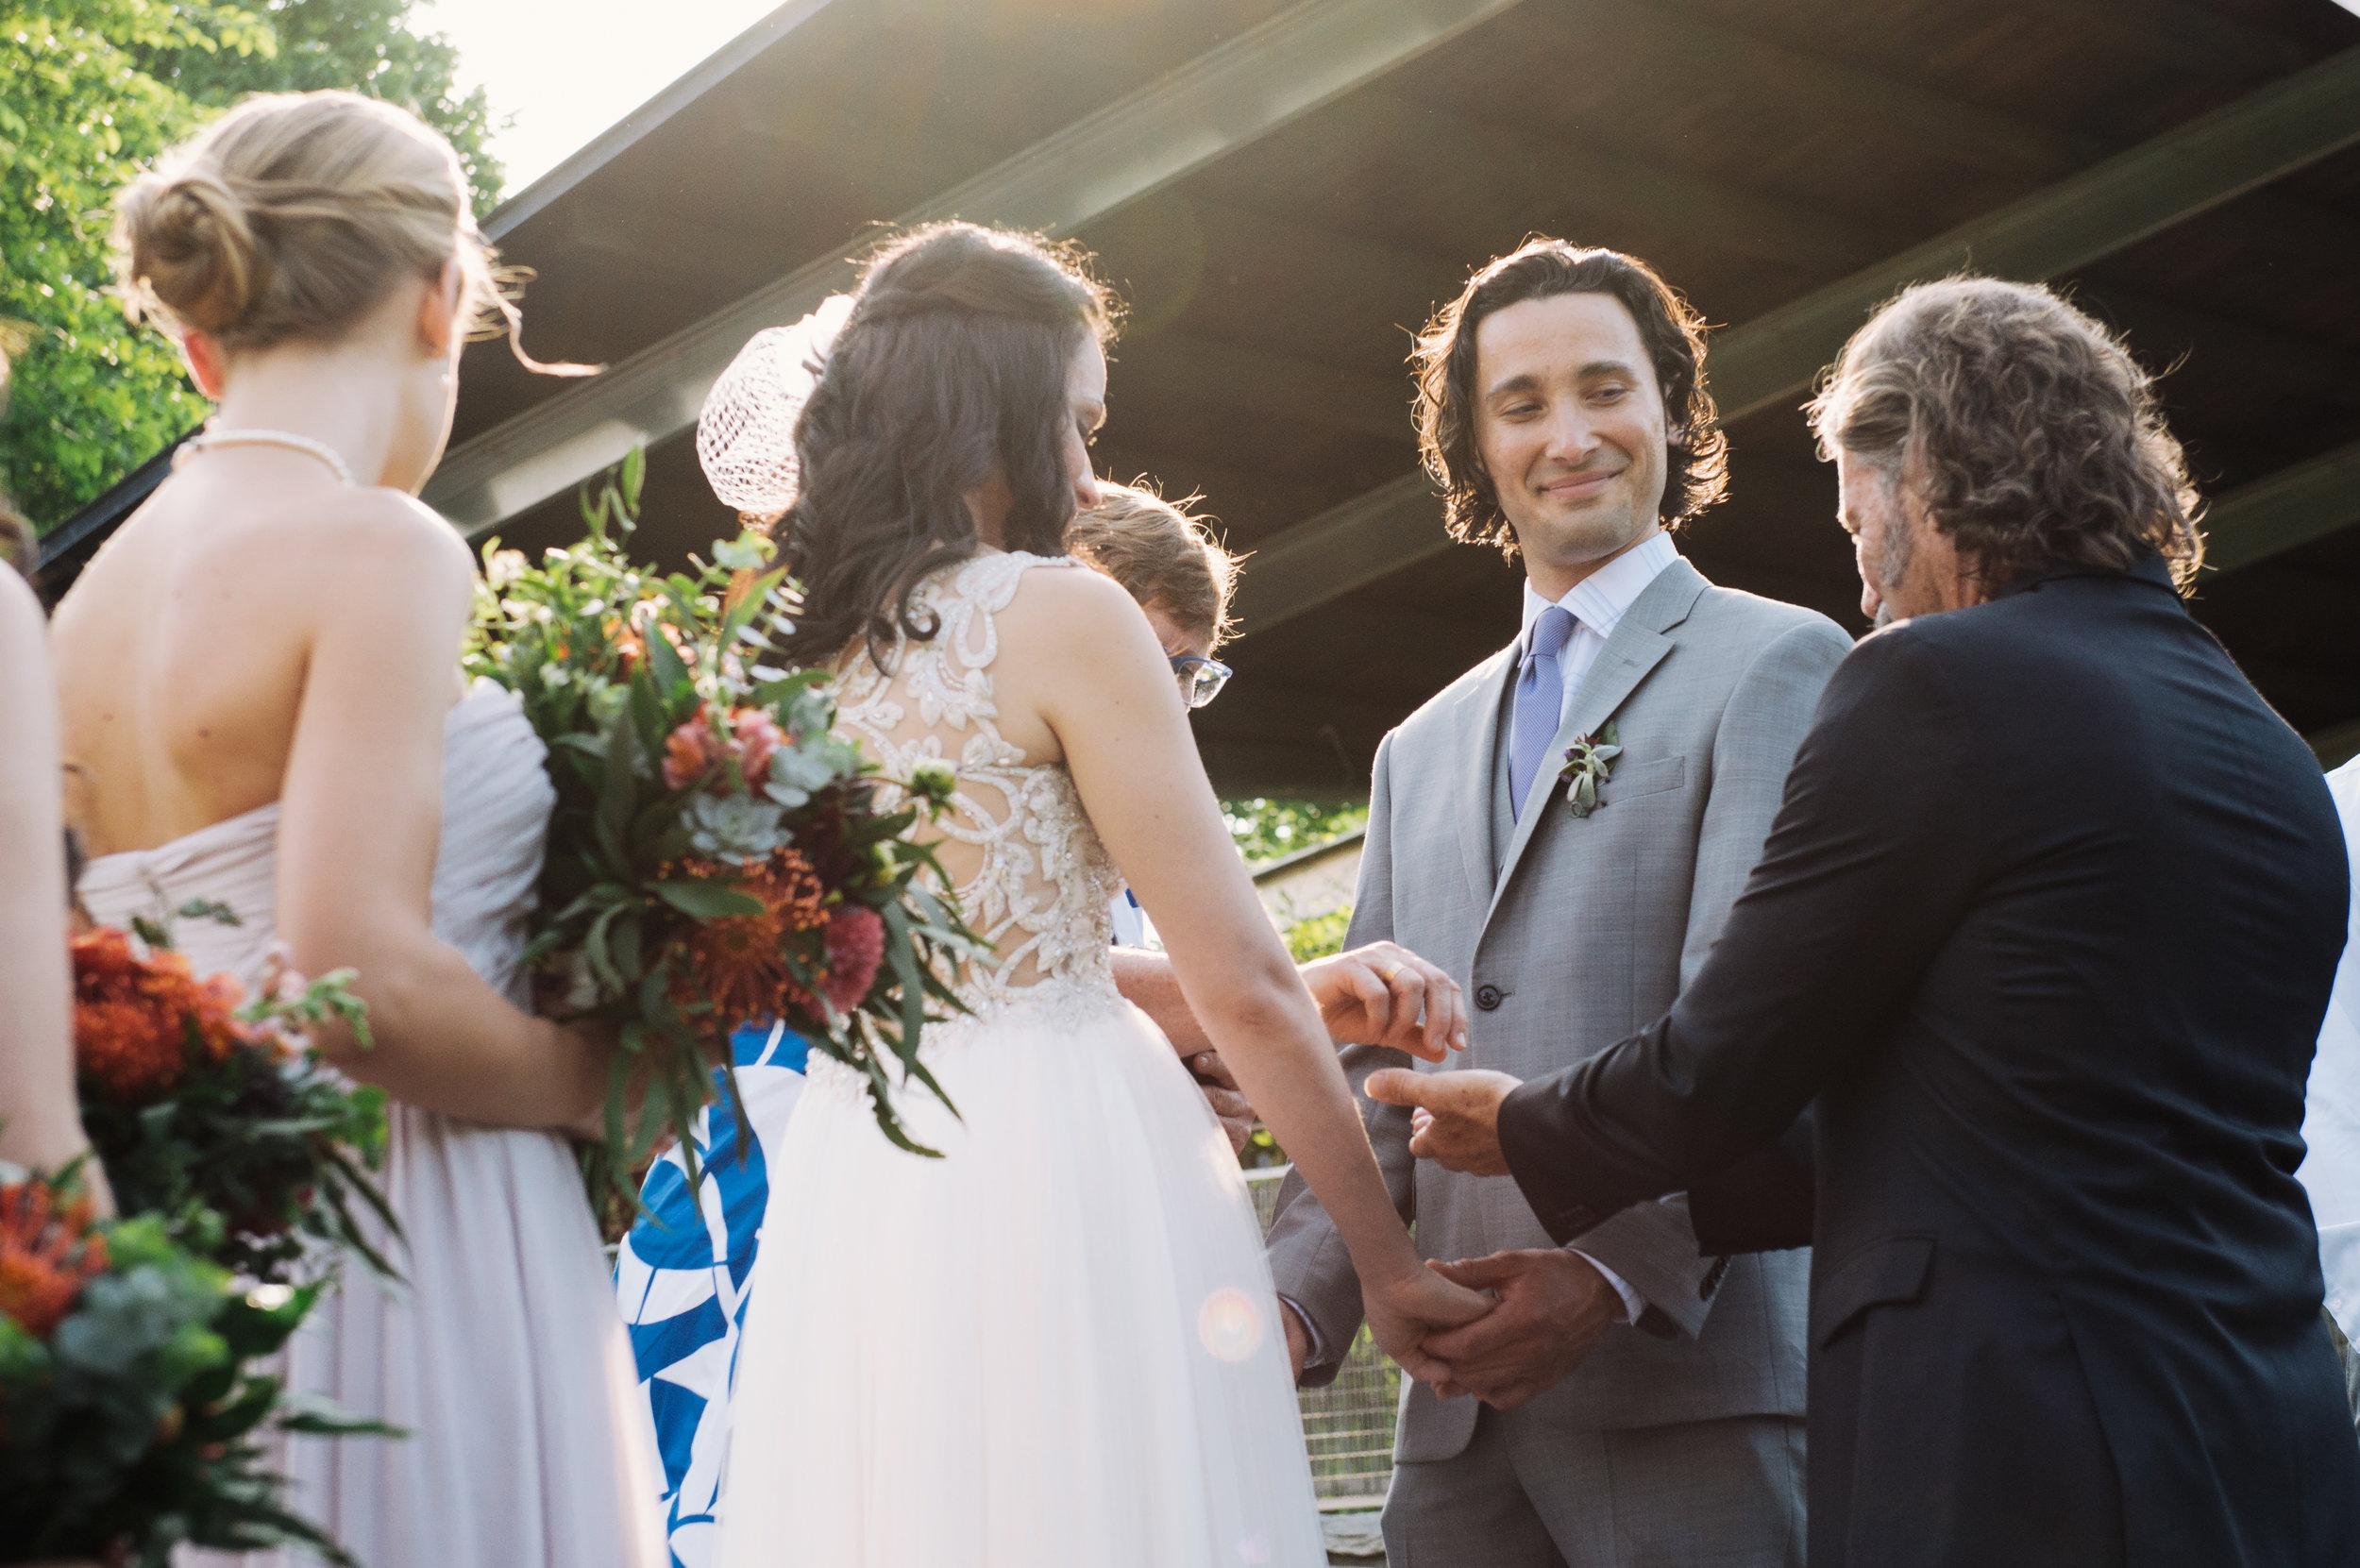 Weddings_BradRaquel_©meghanireland2016_28.jpg